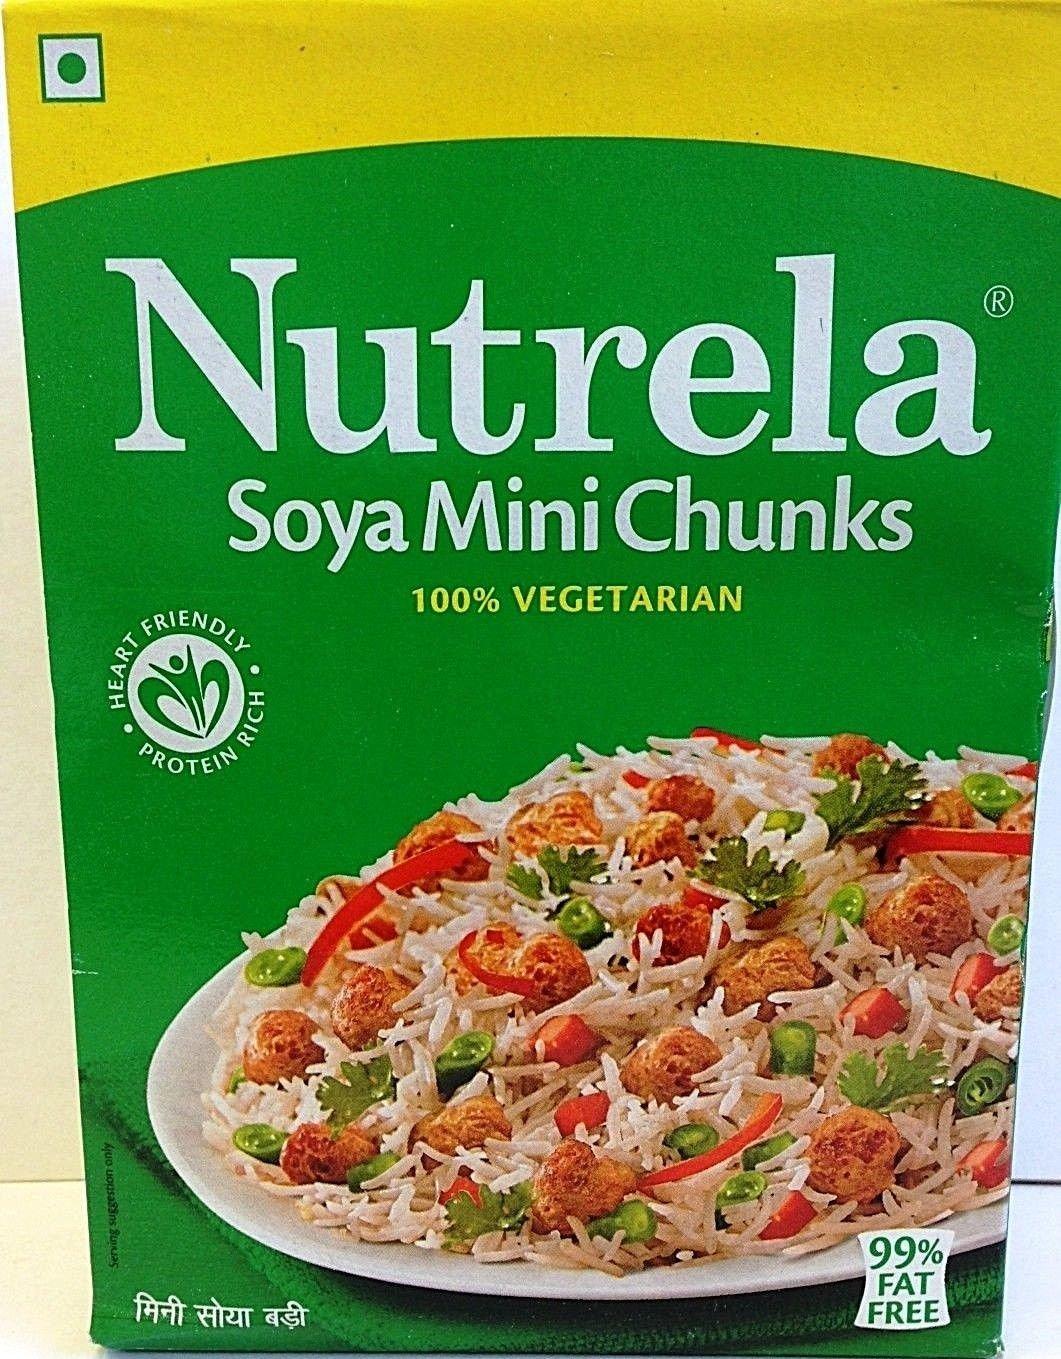 Nutrela Soya Mini Chunks